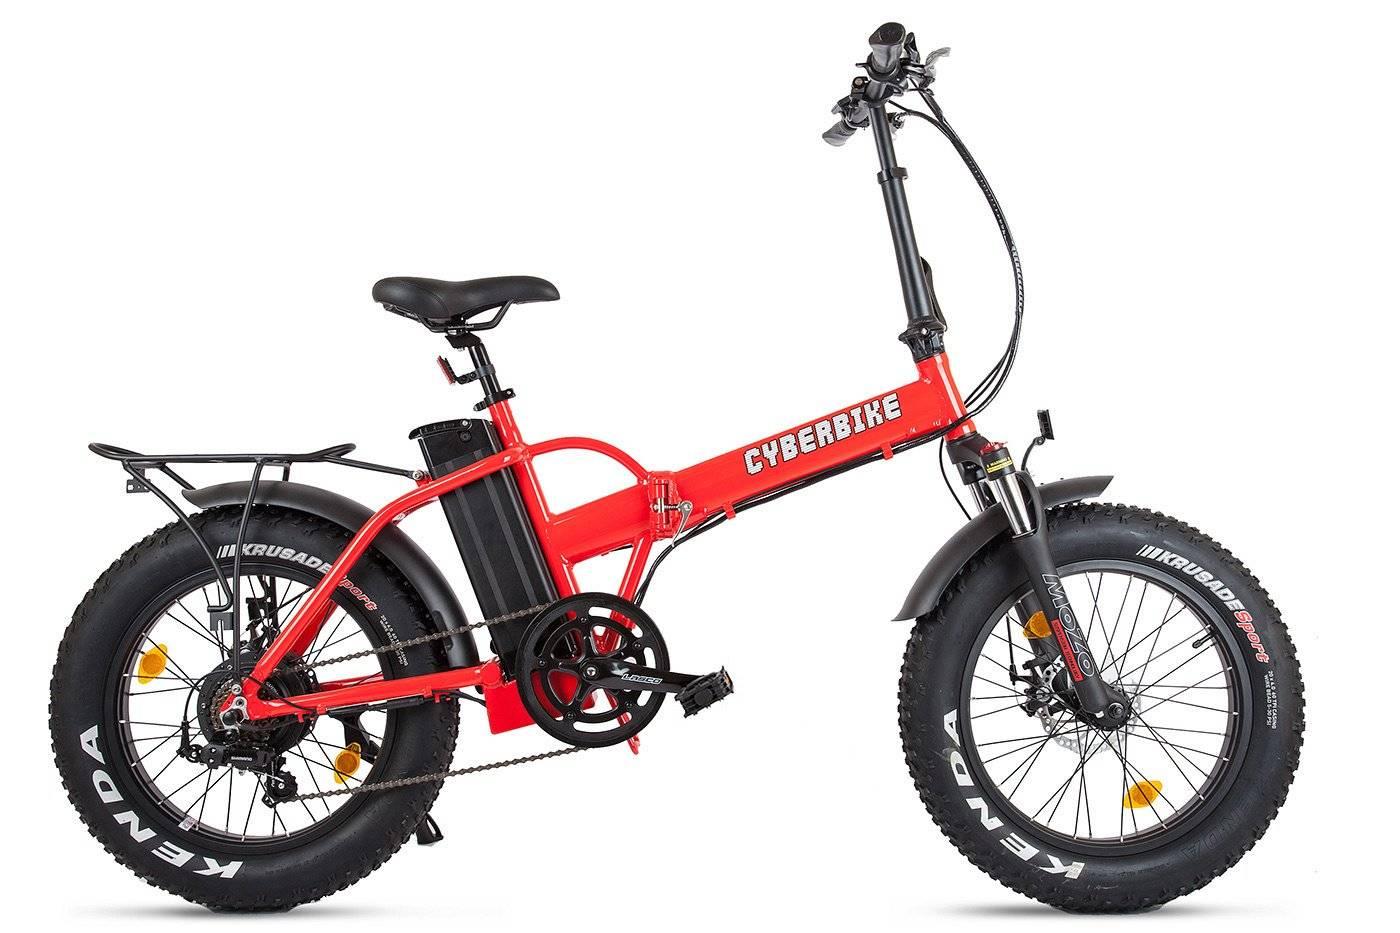 Велогибрид Cyberbike 500 Вт, 019282-1906, фото 7